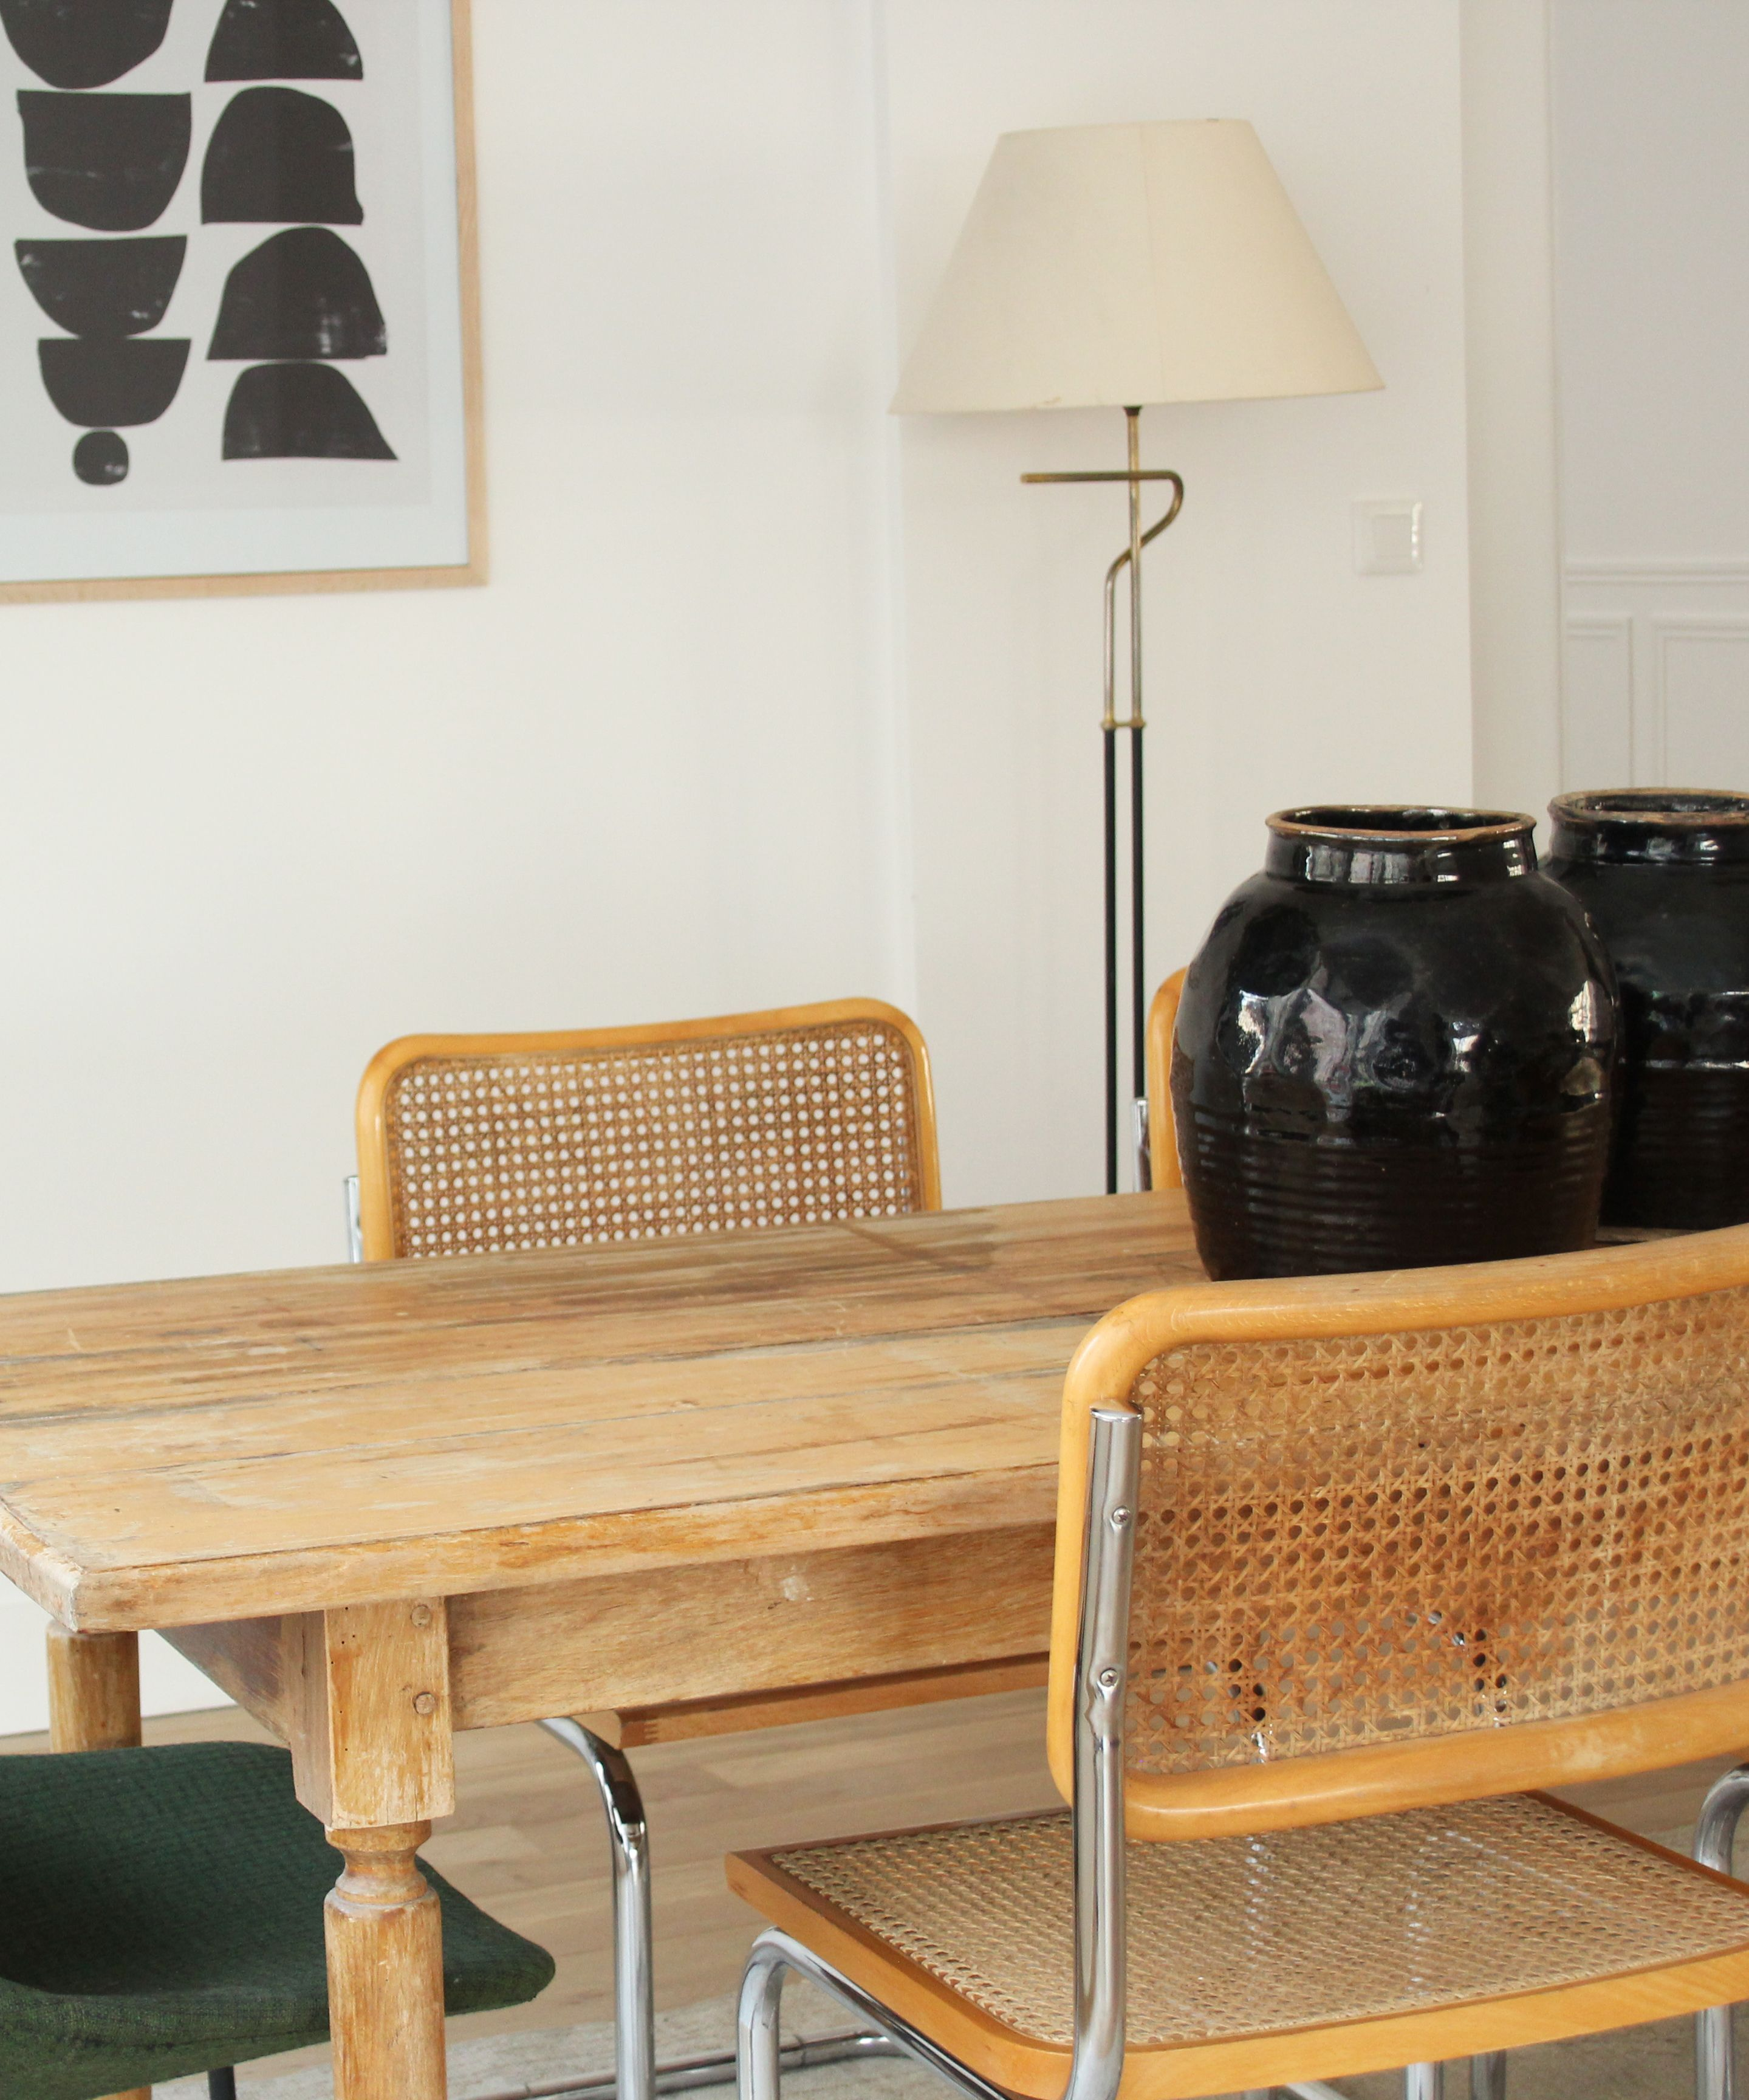 ©Selency Dining Room, Breuer Chair, Jarre, Ethnic Home